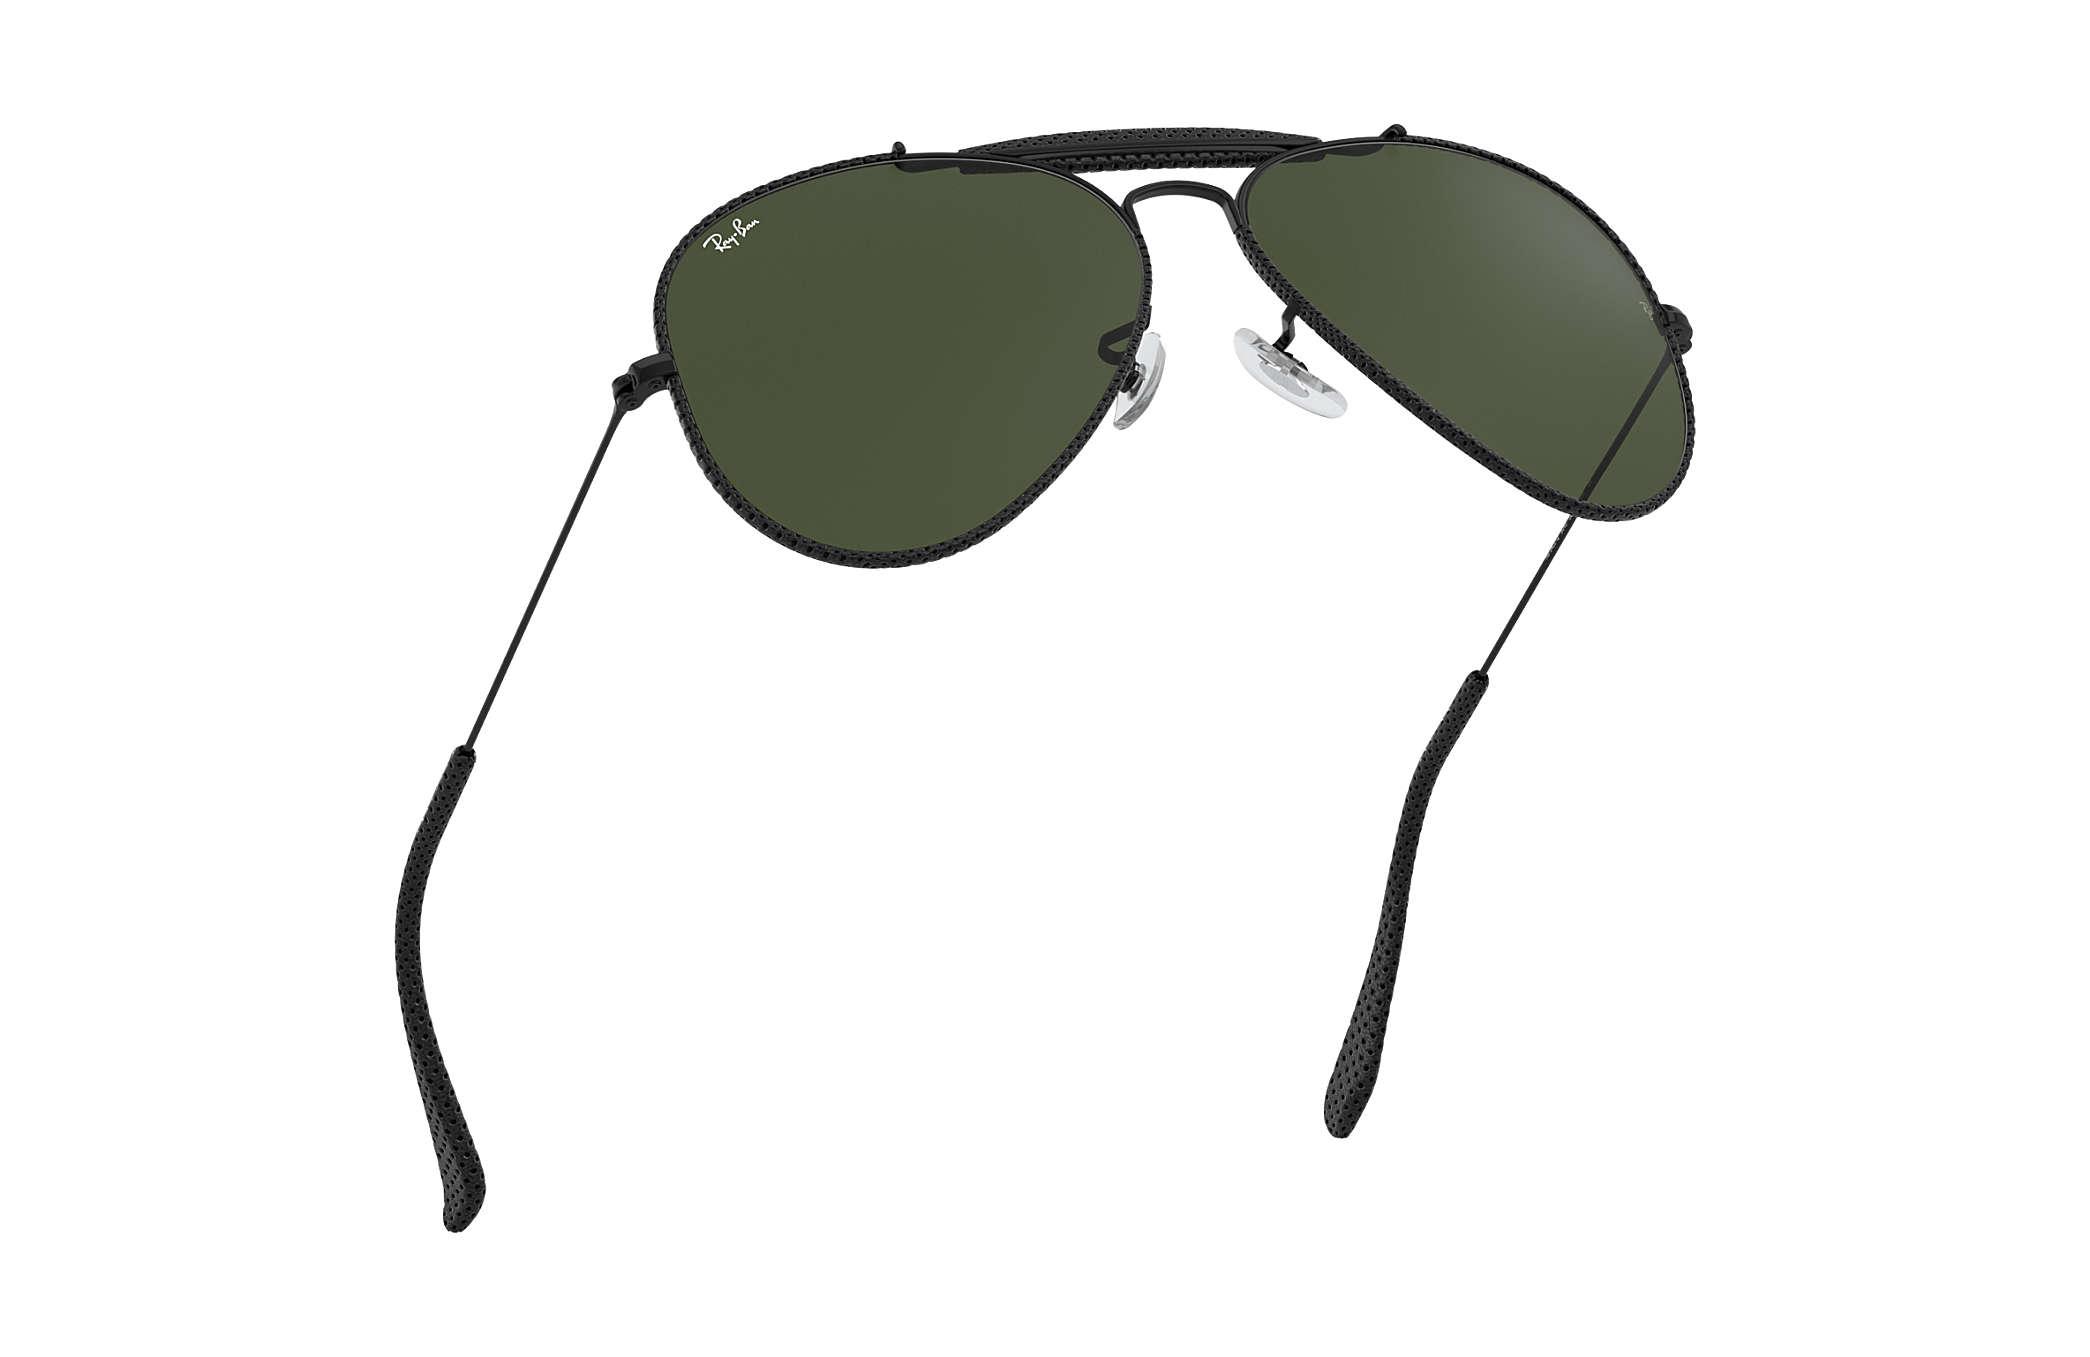 a3524aae4b3 Ray-Ban Outdoorsman Craft RB3422Q Black - Metal - Green Lenses ...